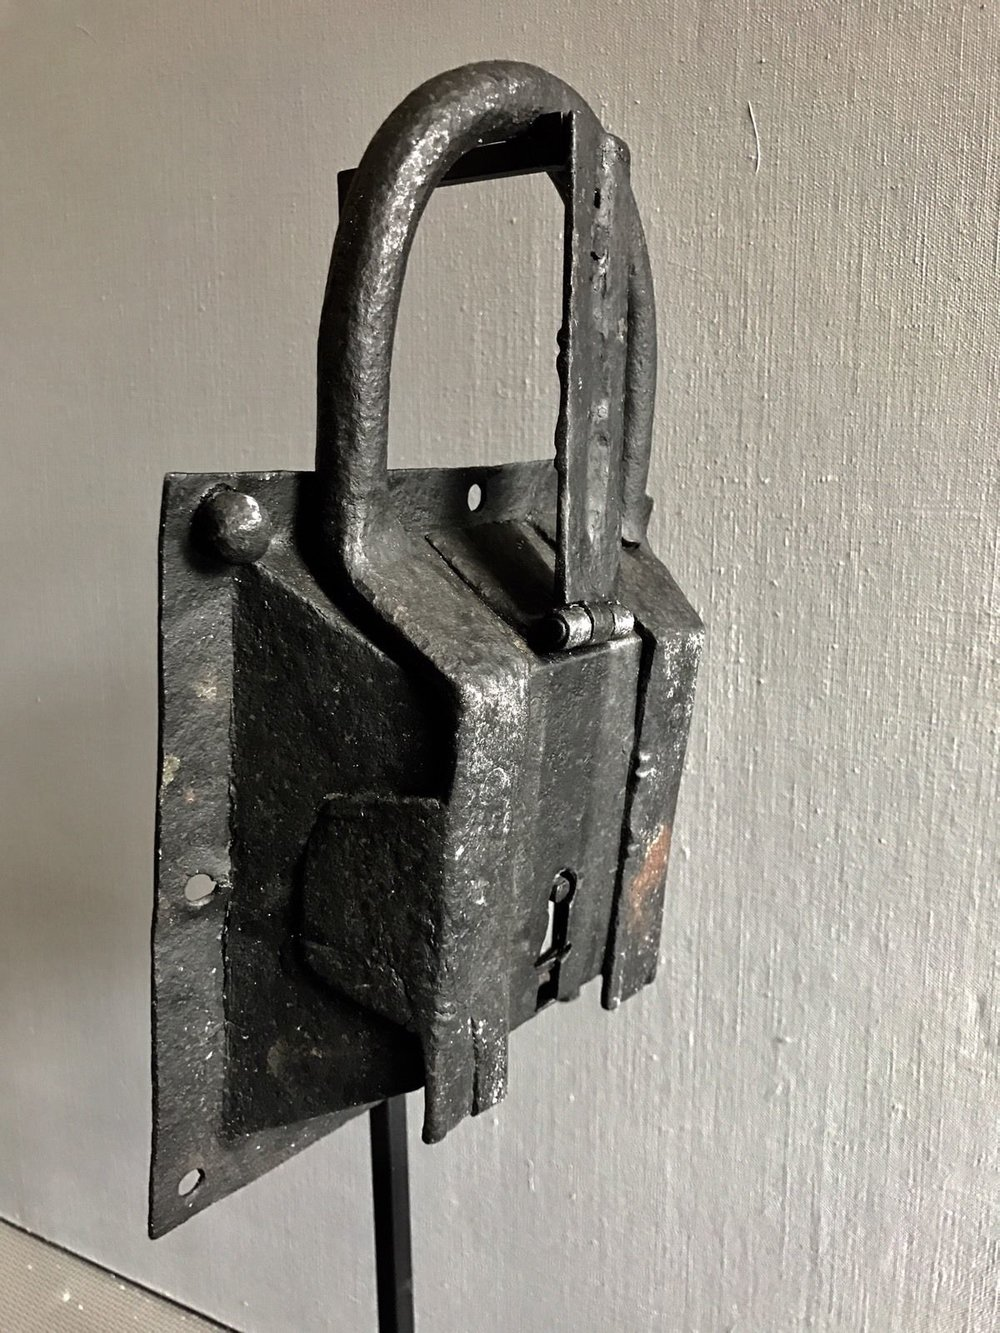 teremok_antiques_medieval_padlock_6.jpg